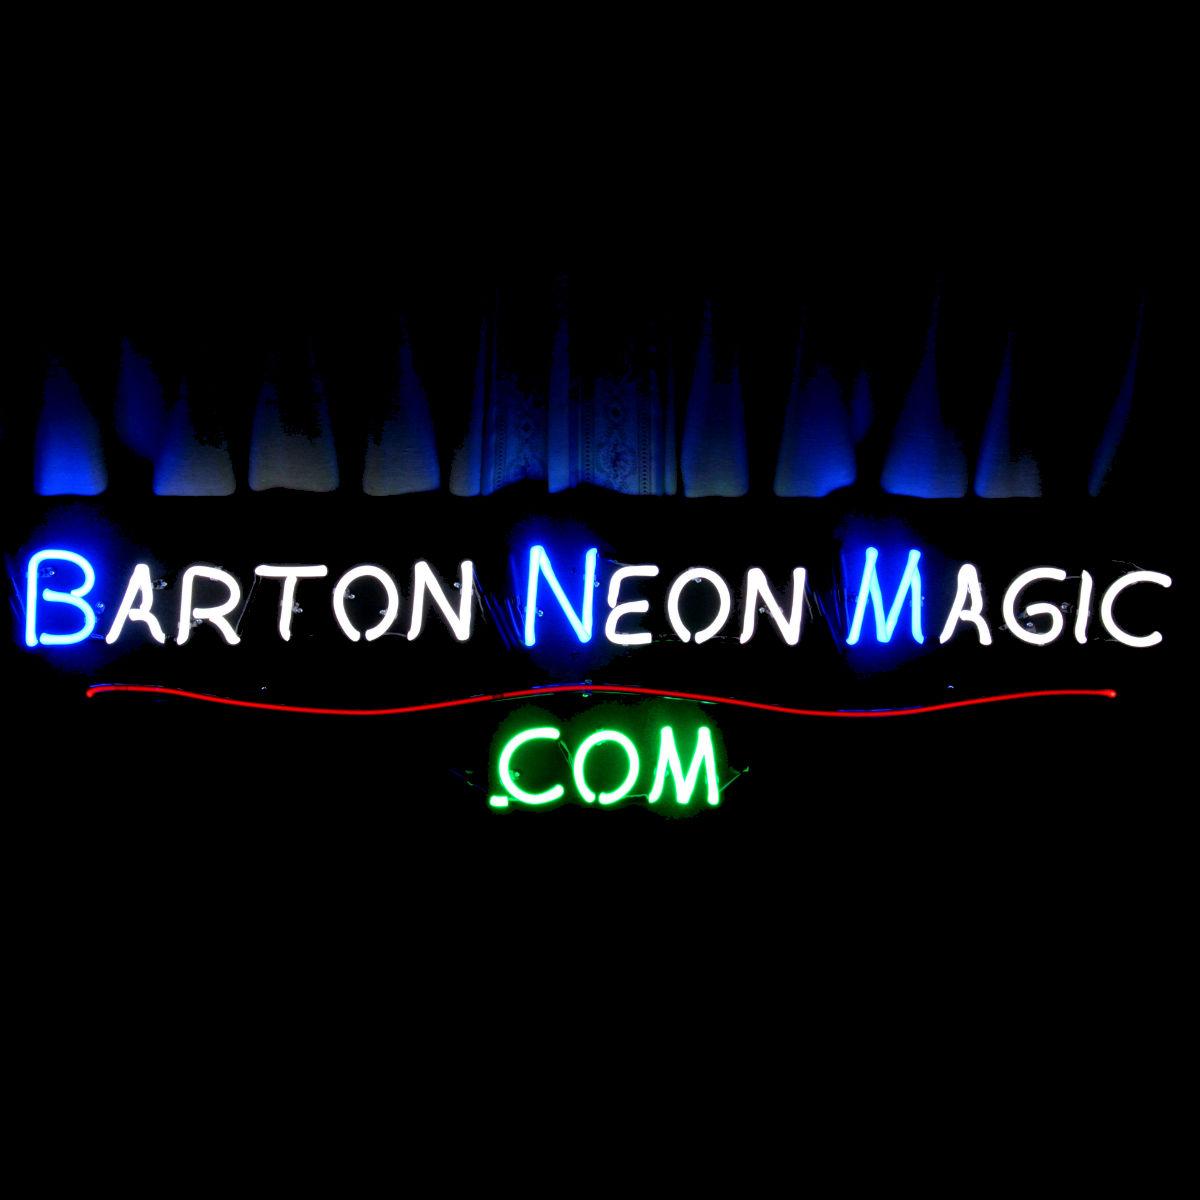 Fine Quality Custom Commercial Neon Signs by John Barton - Famous USA Neon Glassblower - BartonNeonMagic.com